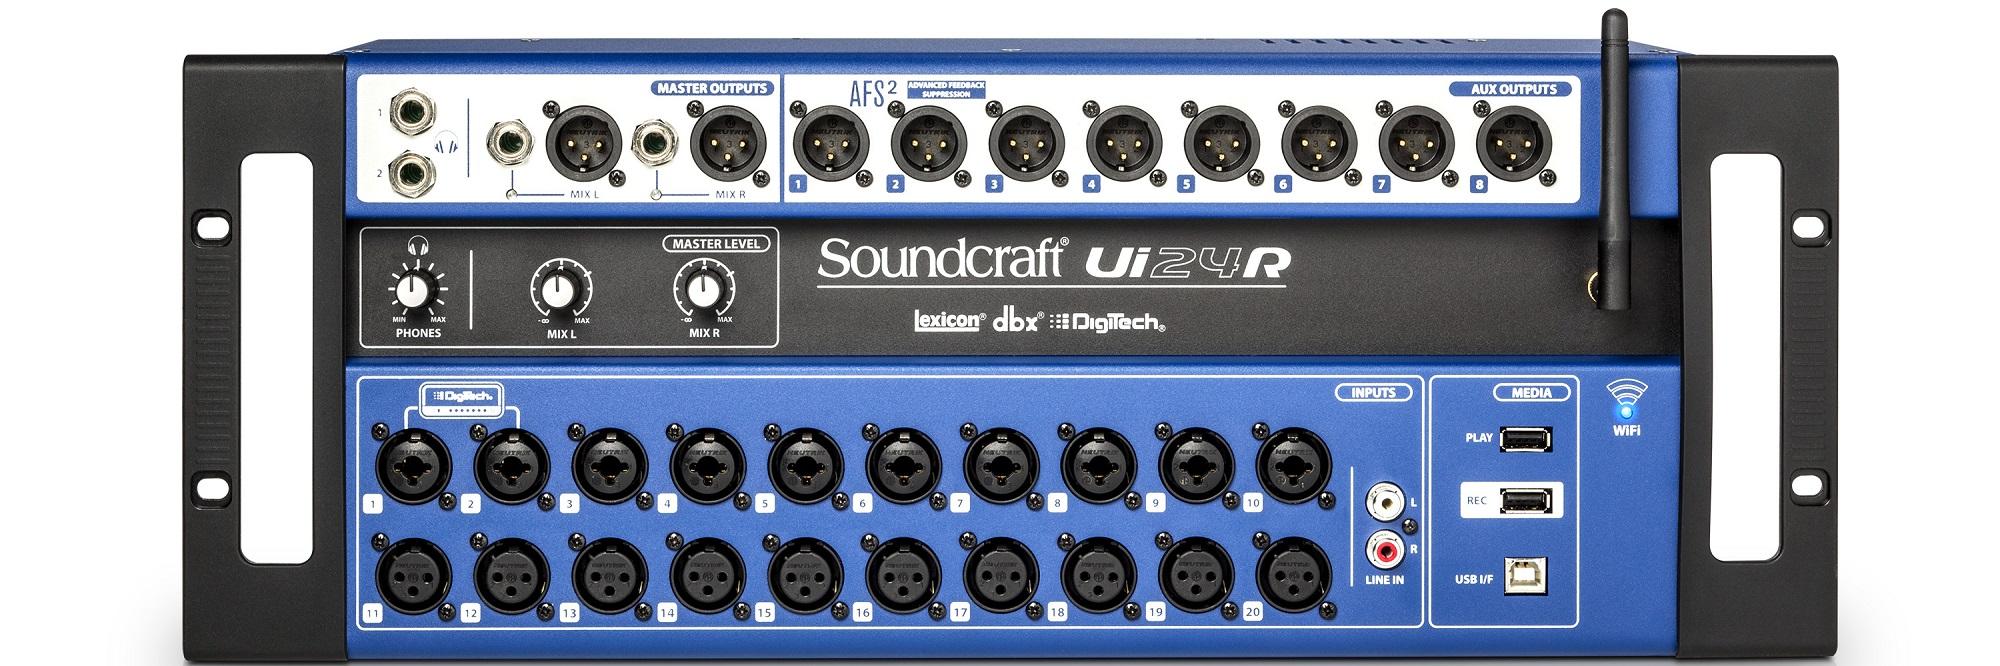 Mixer Soundcraft Ui24R | Anh Duy Audio